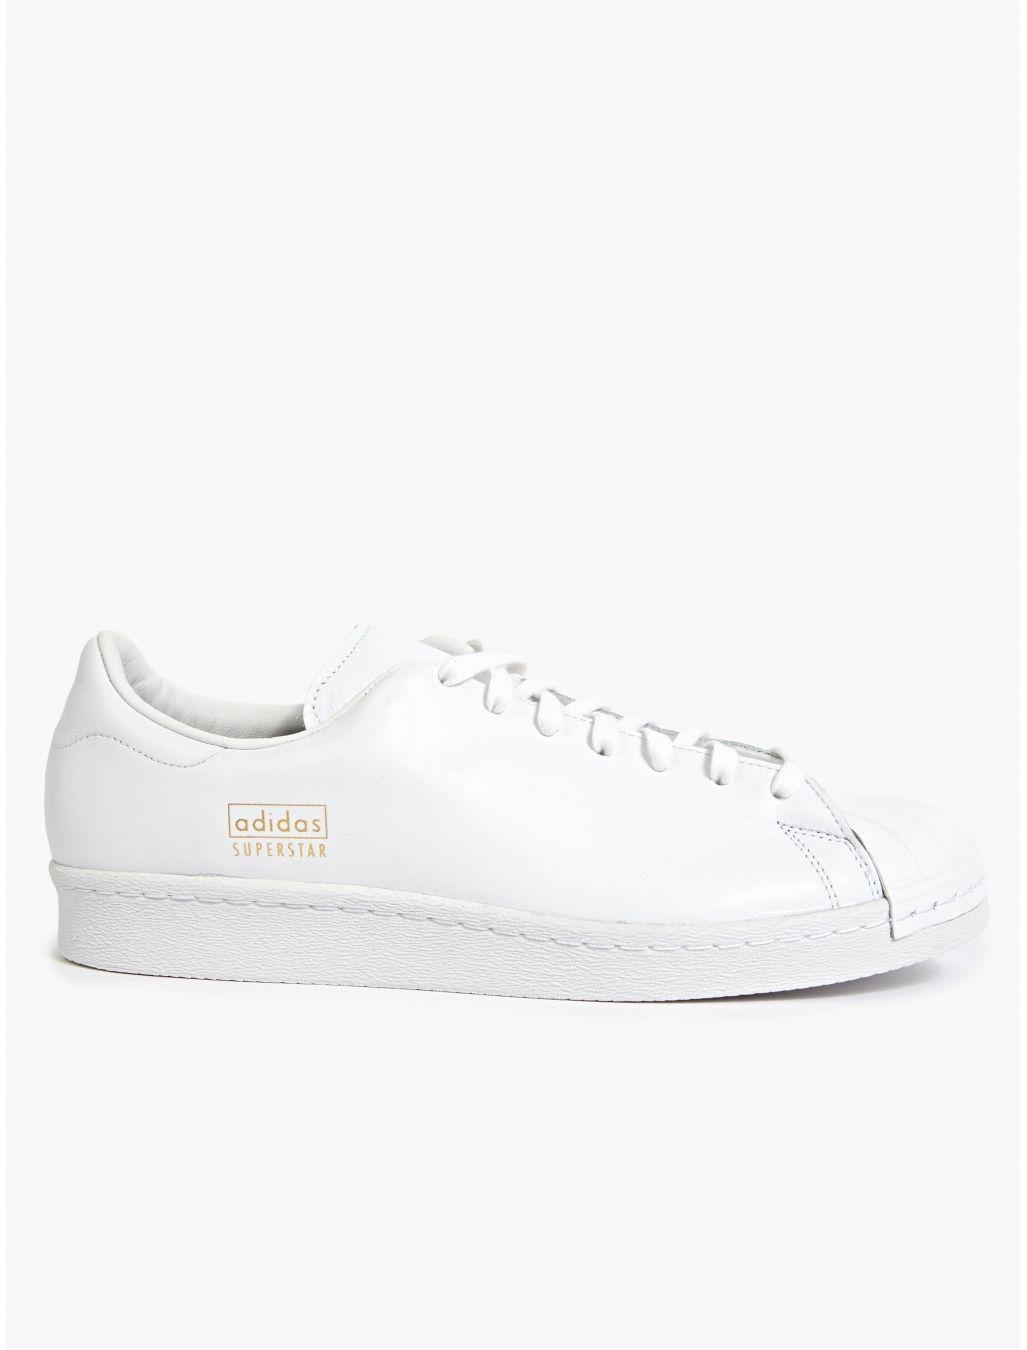 the latest c18b2 49808 adidas Originals Men s Superstar  80s Clean Sneakers   oki-ni